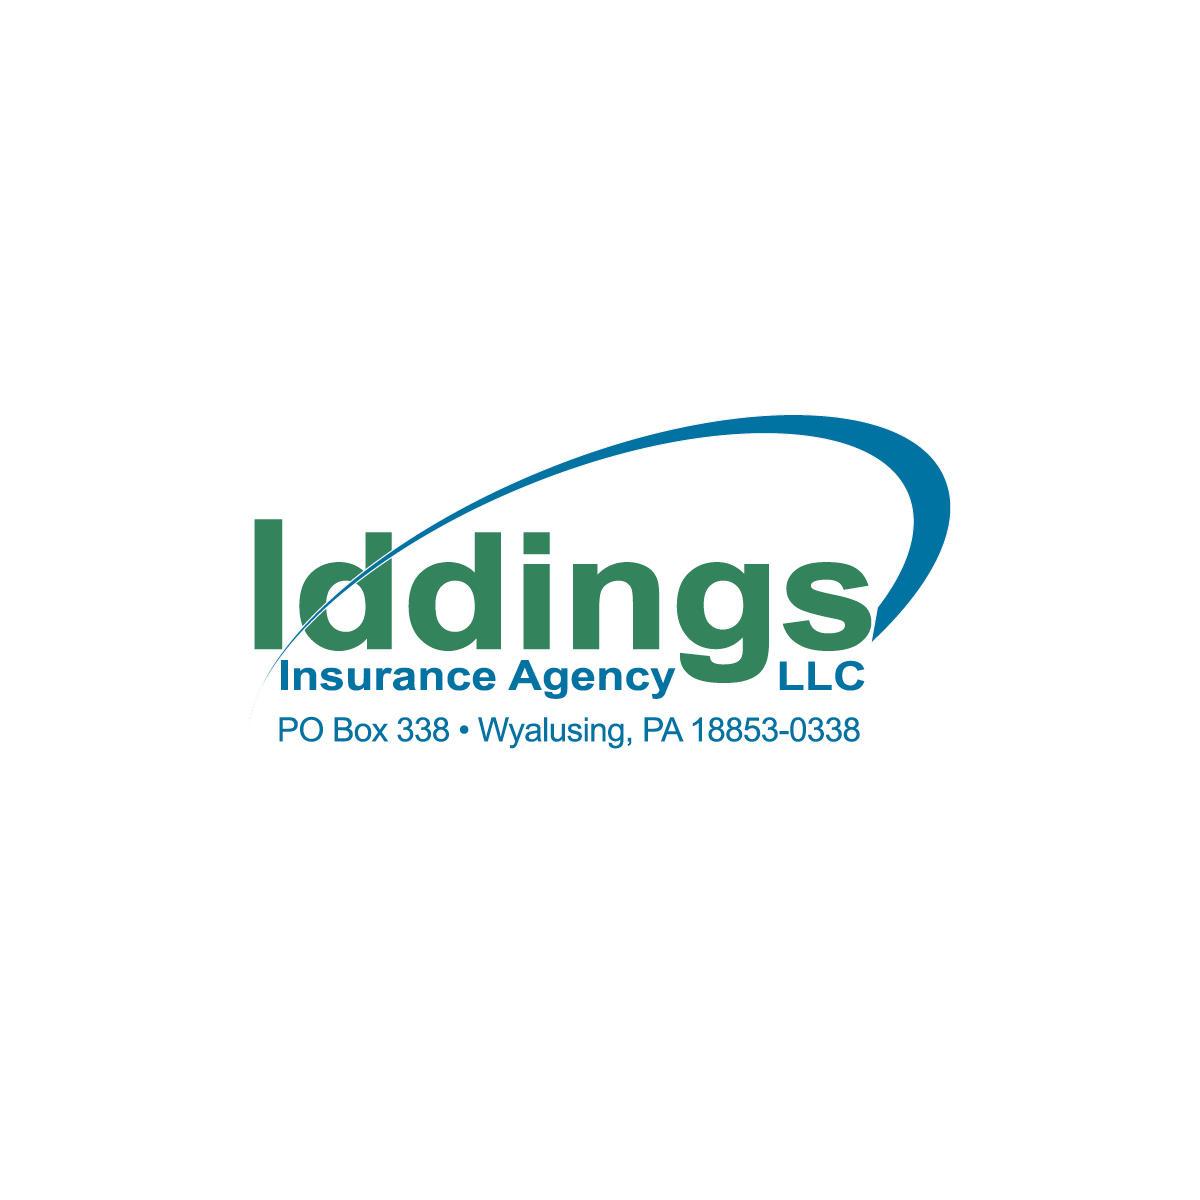 Iddings Insurance Agency LLC - Wyalusing, PA 18853 - (570)746-3434 | ShowMeLocal.com